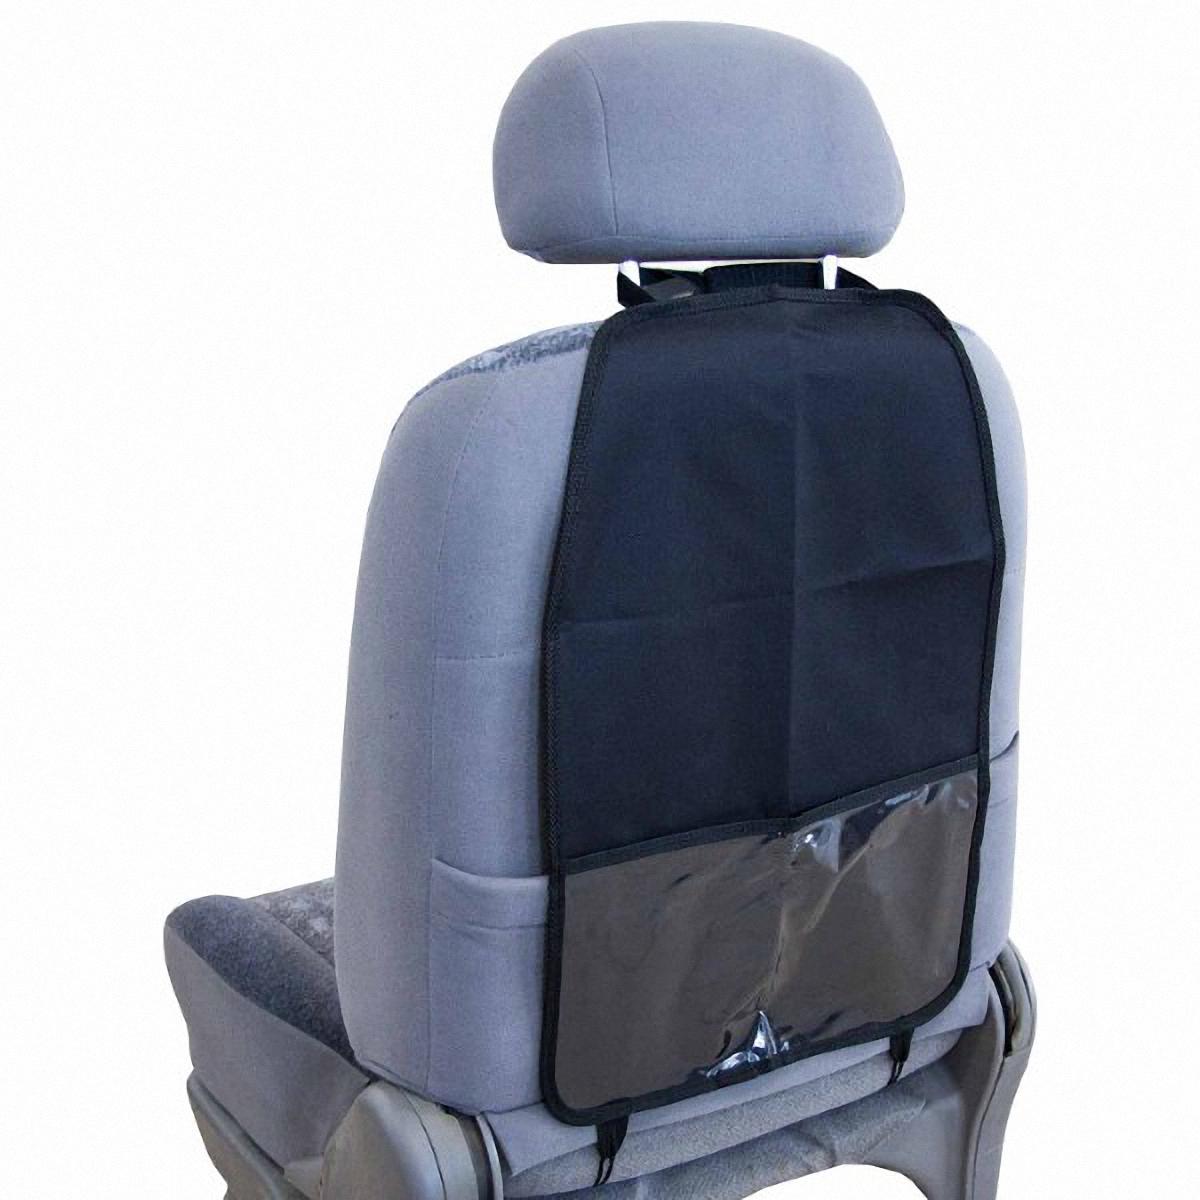 Накидка защитная Skyway, на спинку сидения, 37 х 55 см защита спинки сиденья skyway s06101011 black